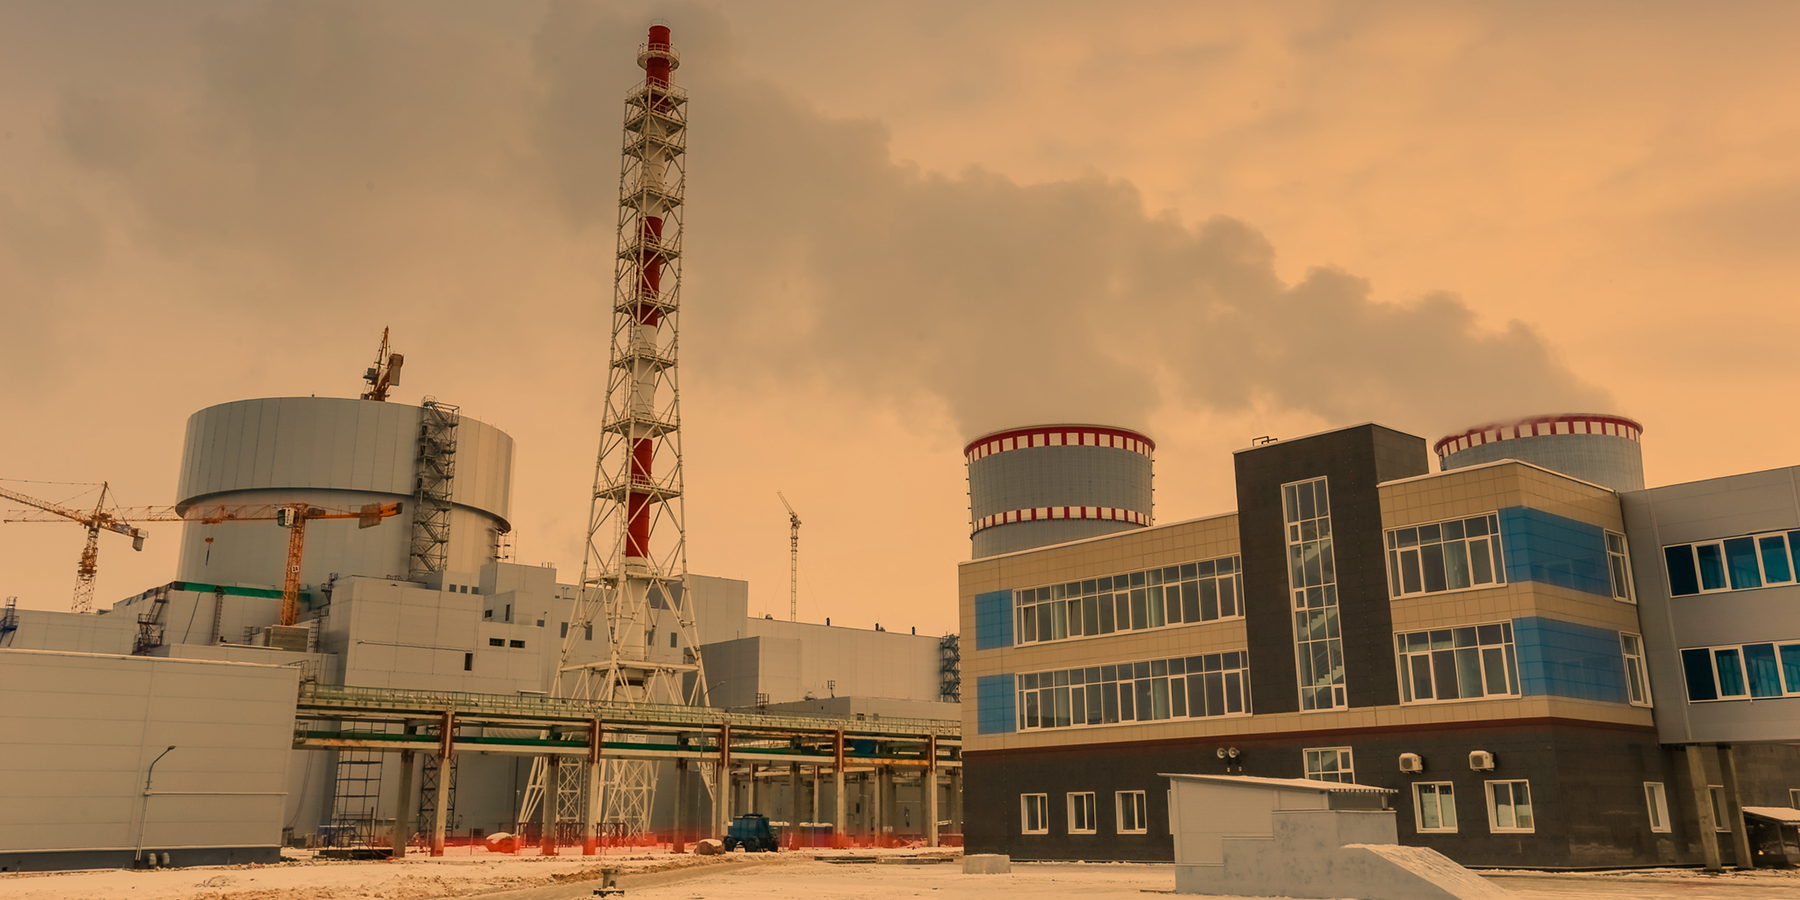 этот картинка бор атомная электростанция фото